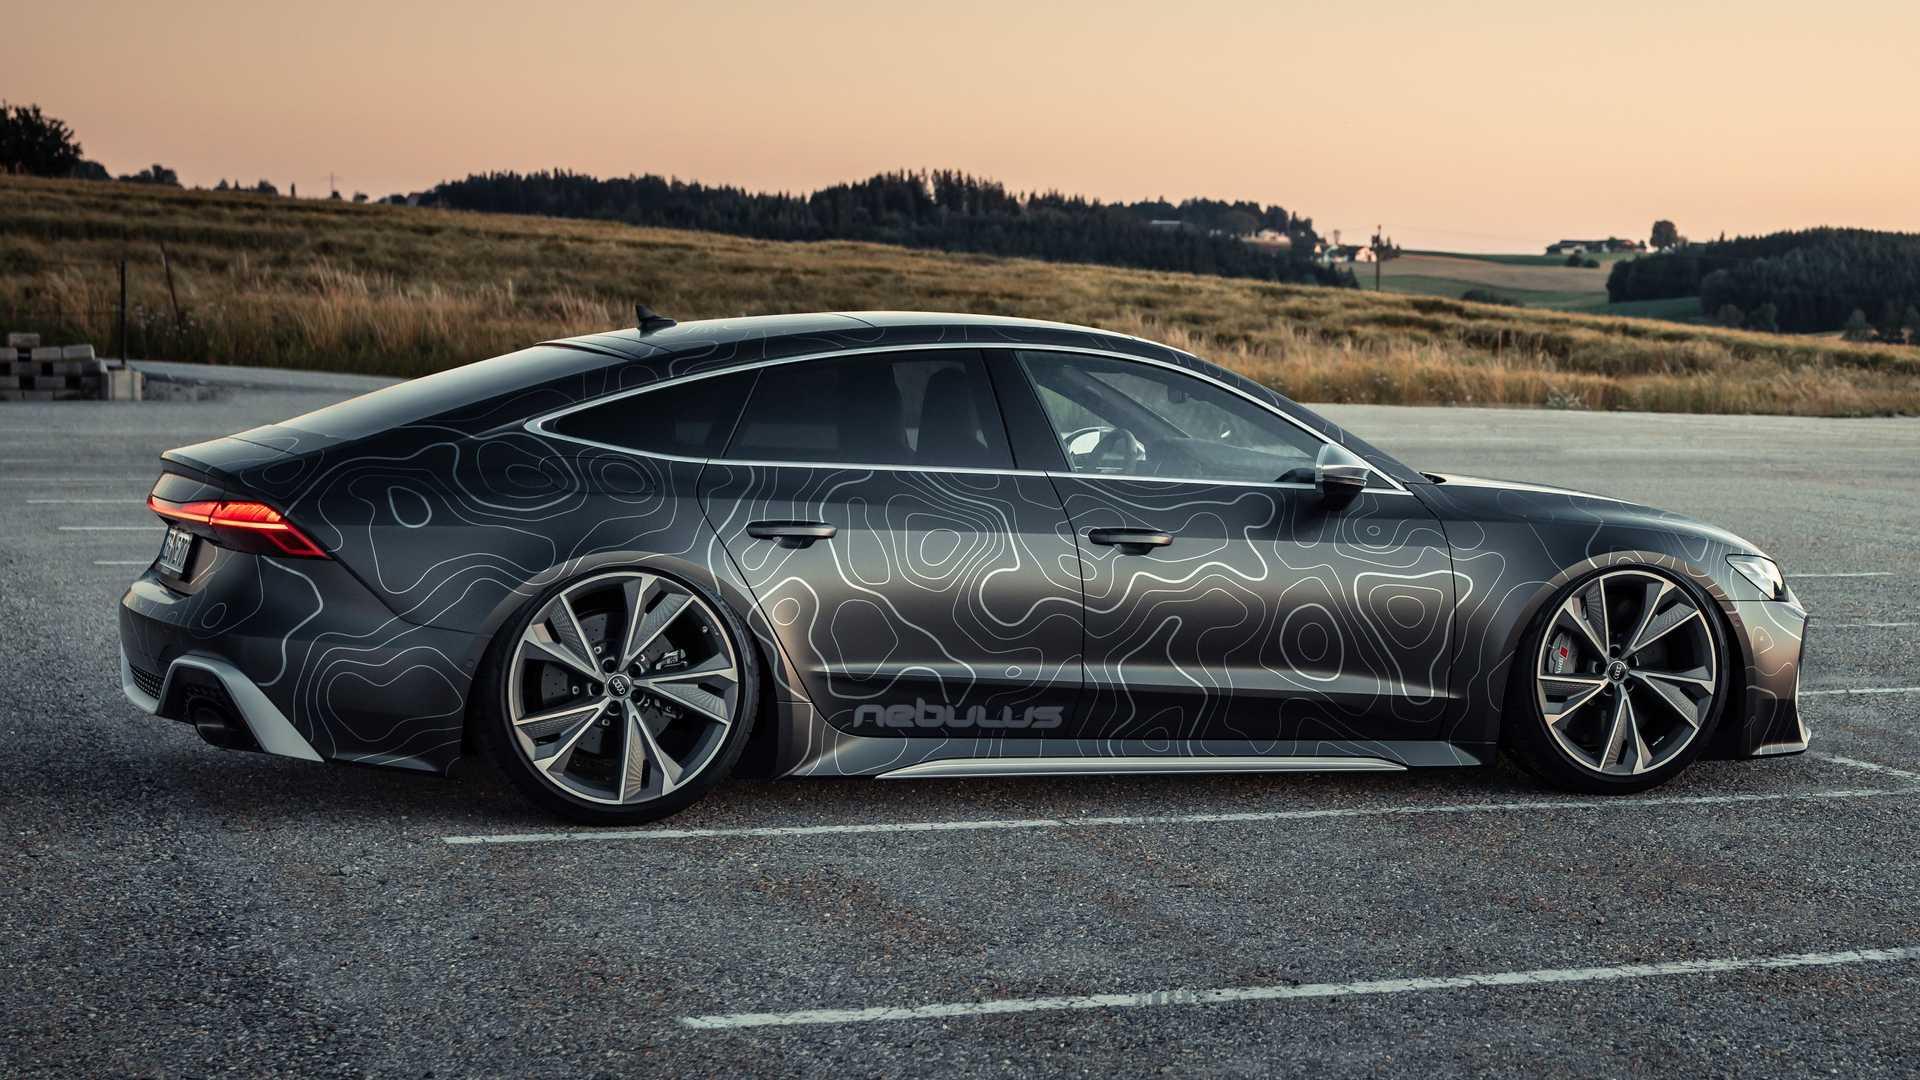 Audi-RS7-By-Black-Box-Richter-2